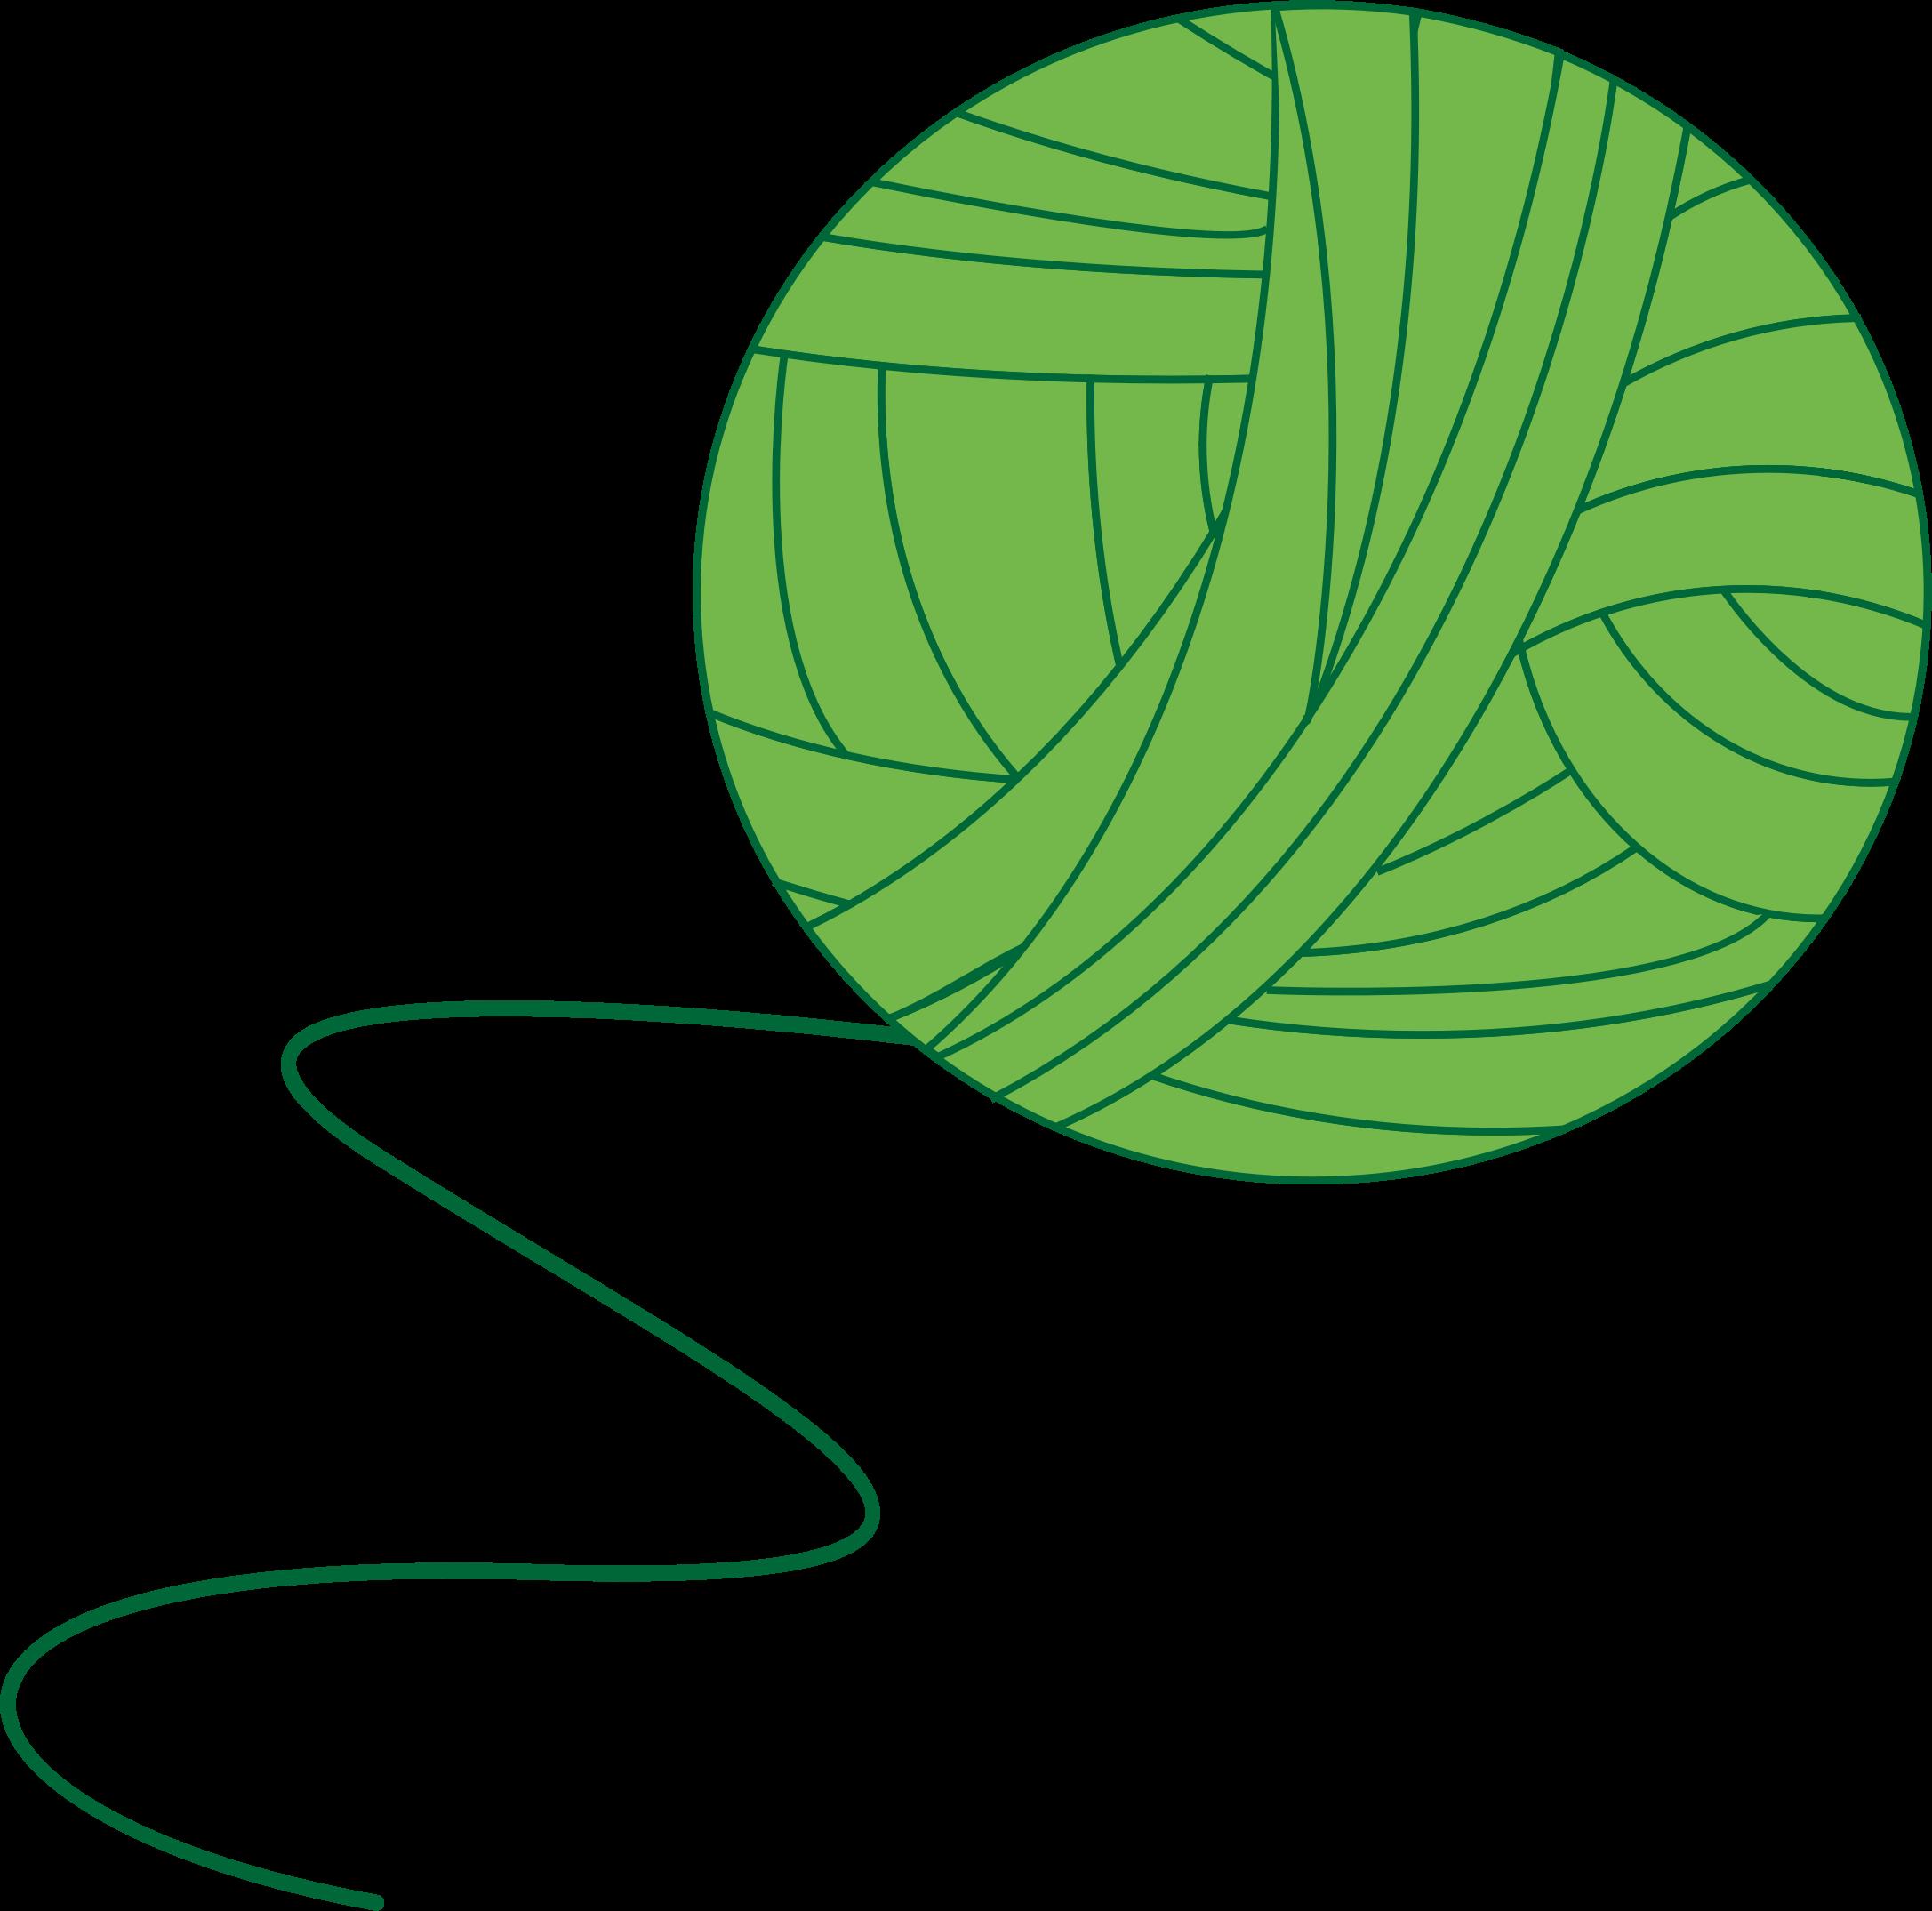 PNG Yarn - 41705